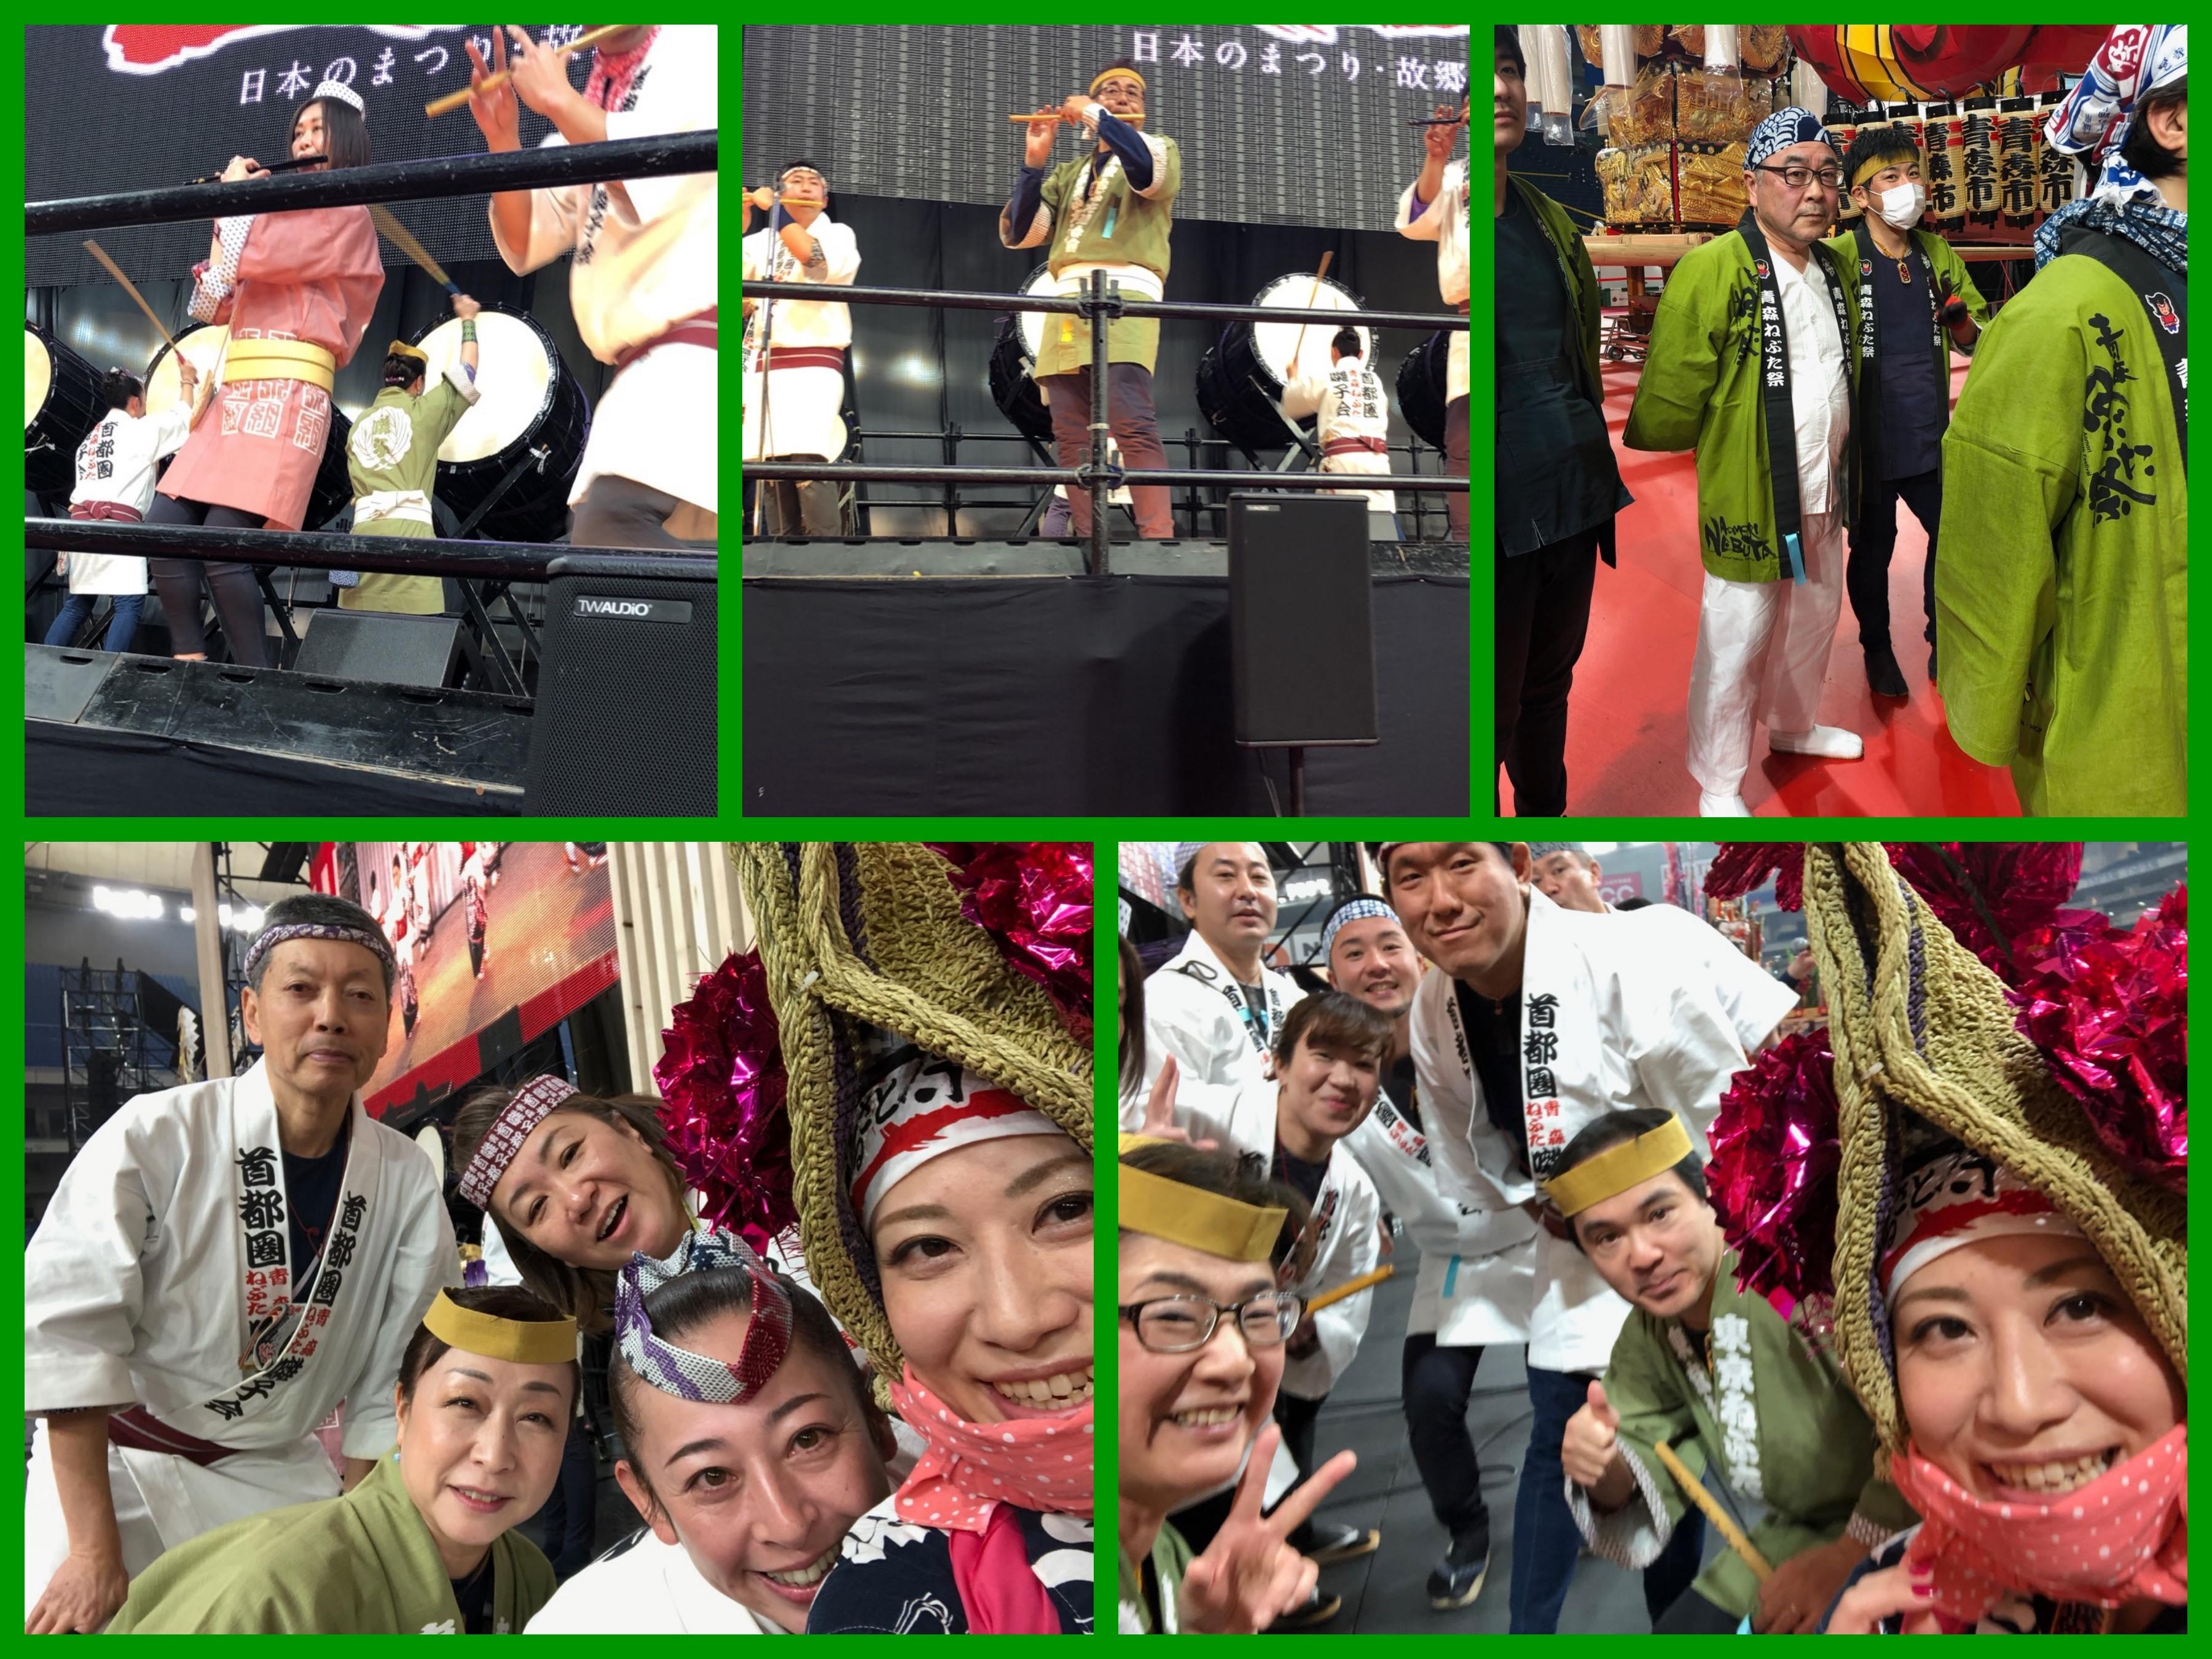 Collage_Fotor_20190130173938d04.jpg